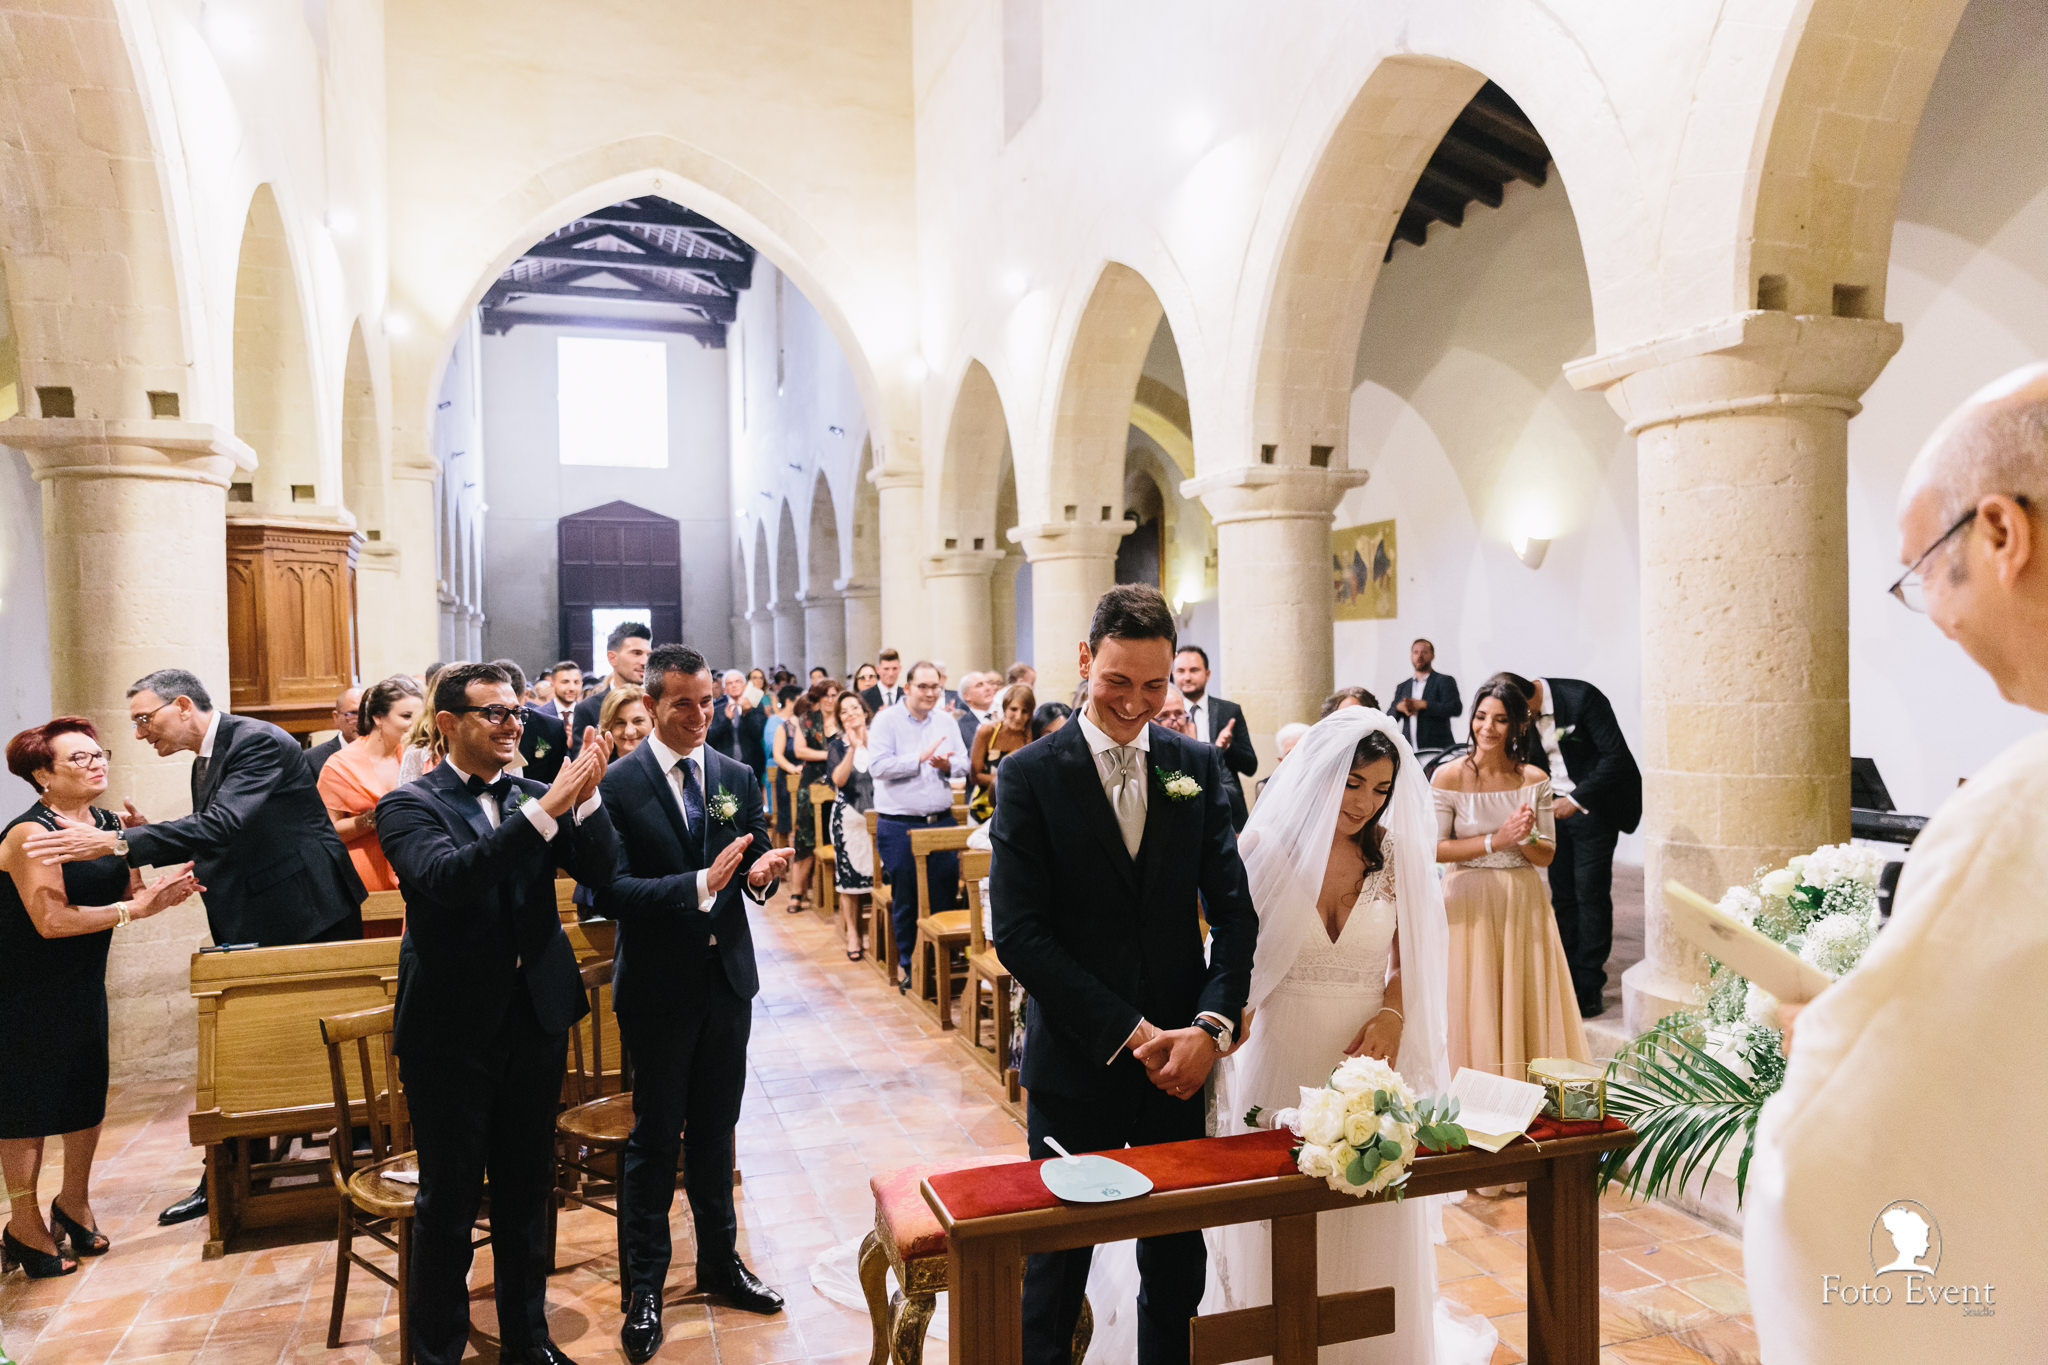 025-2019-08-23-Matrimonio-Lucia-e-Rosario-Scopelliti-5DE-1379